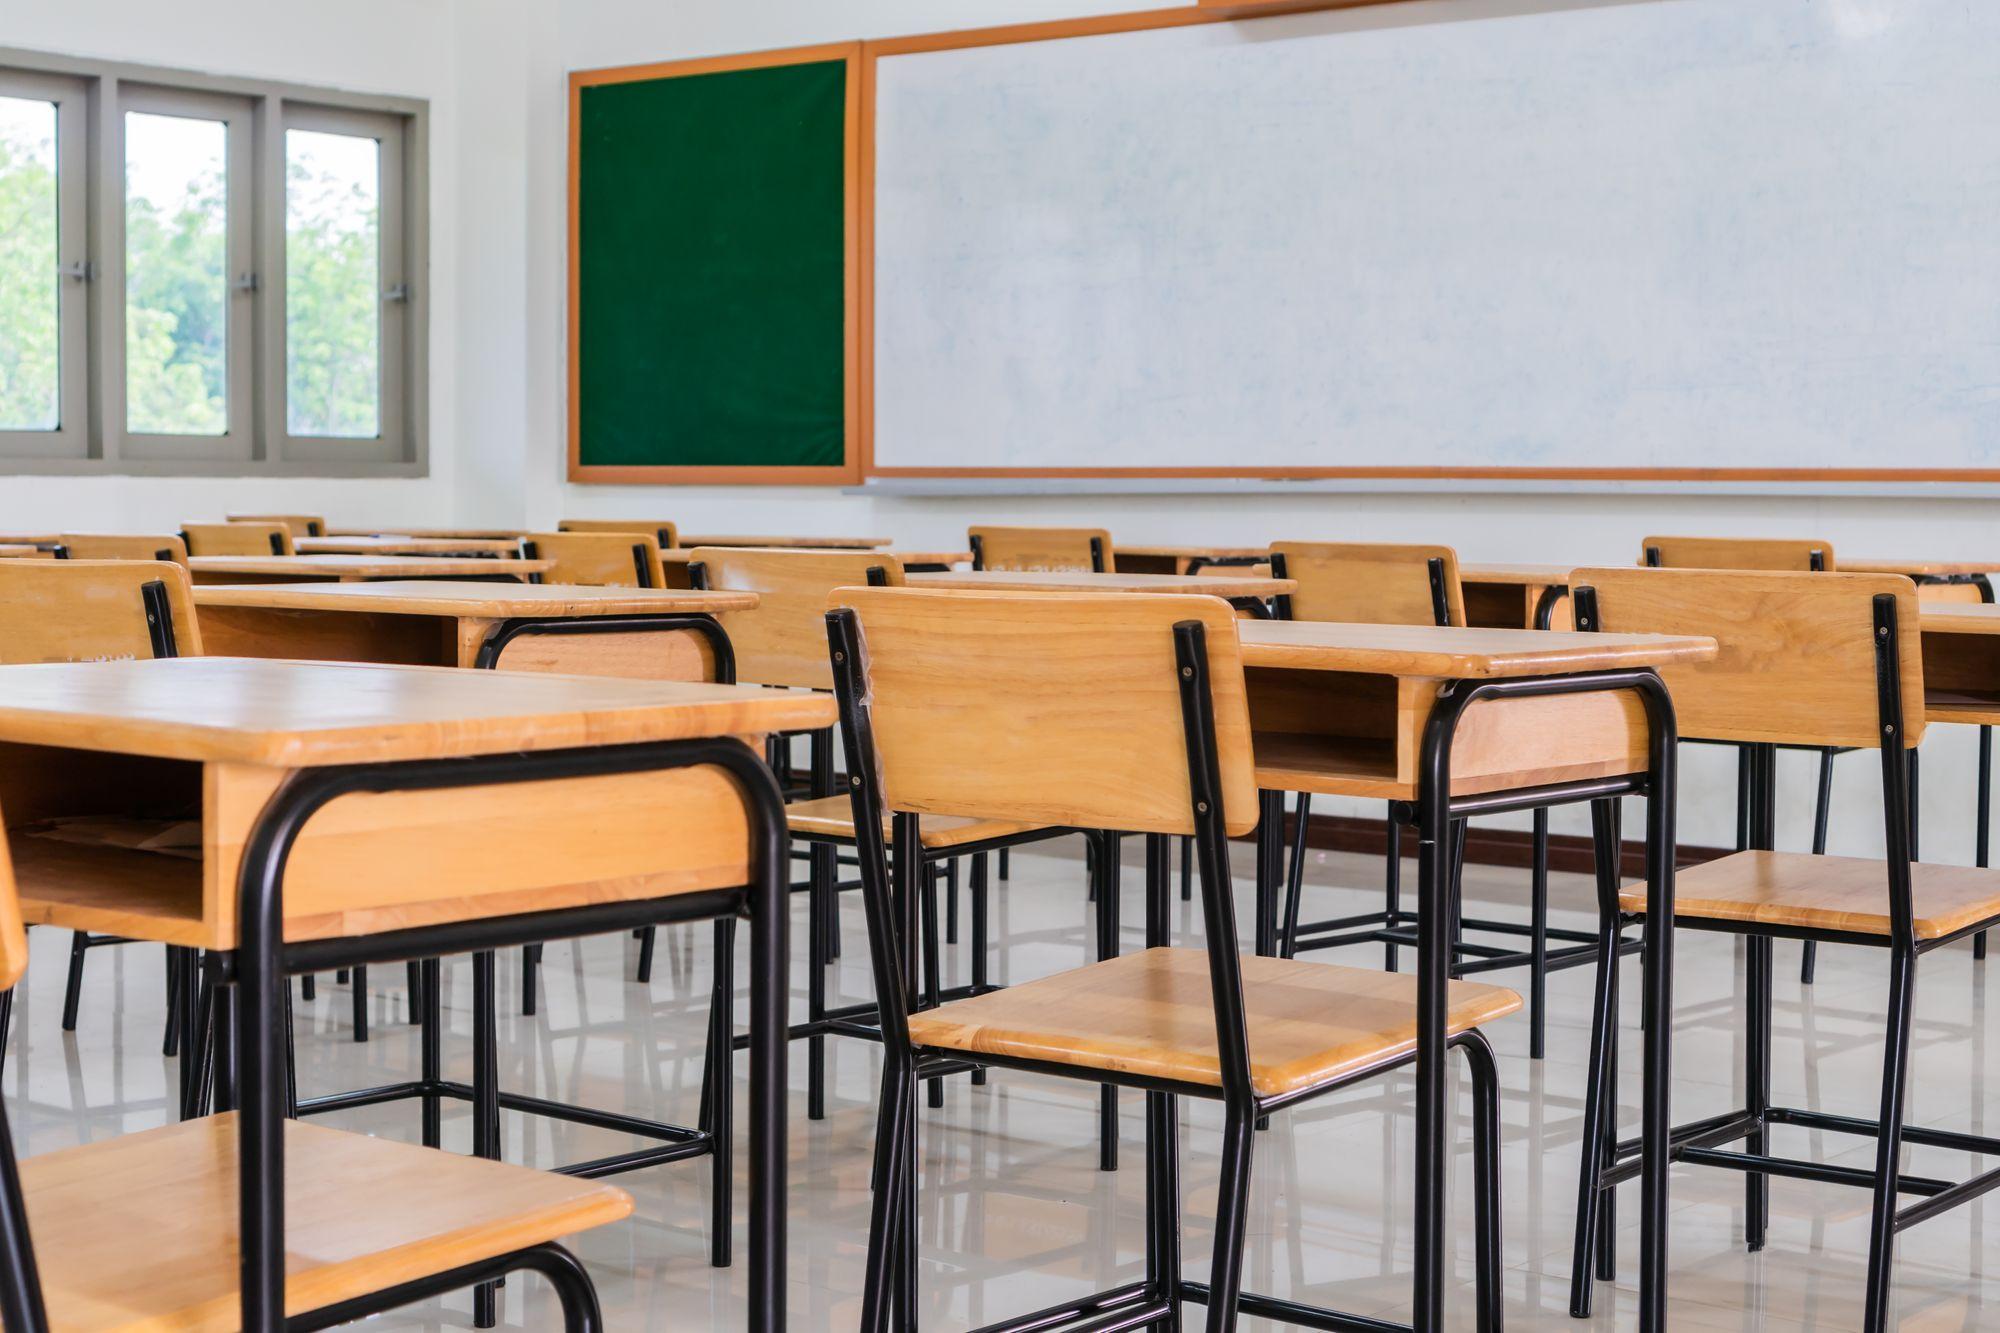 Clean classroom, clean school, hygiene school, hygiene classroom